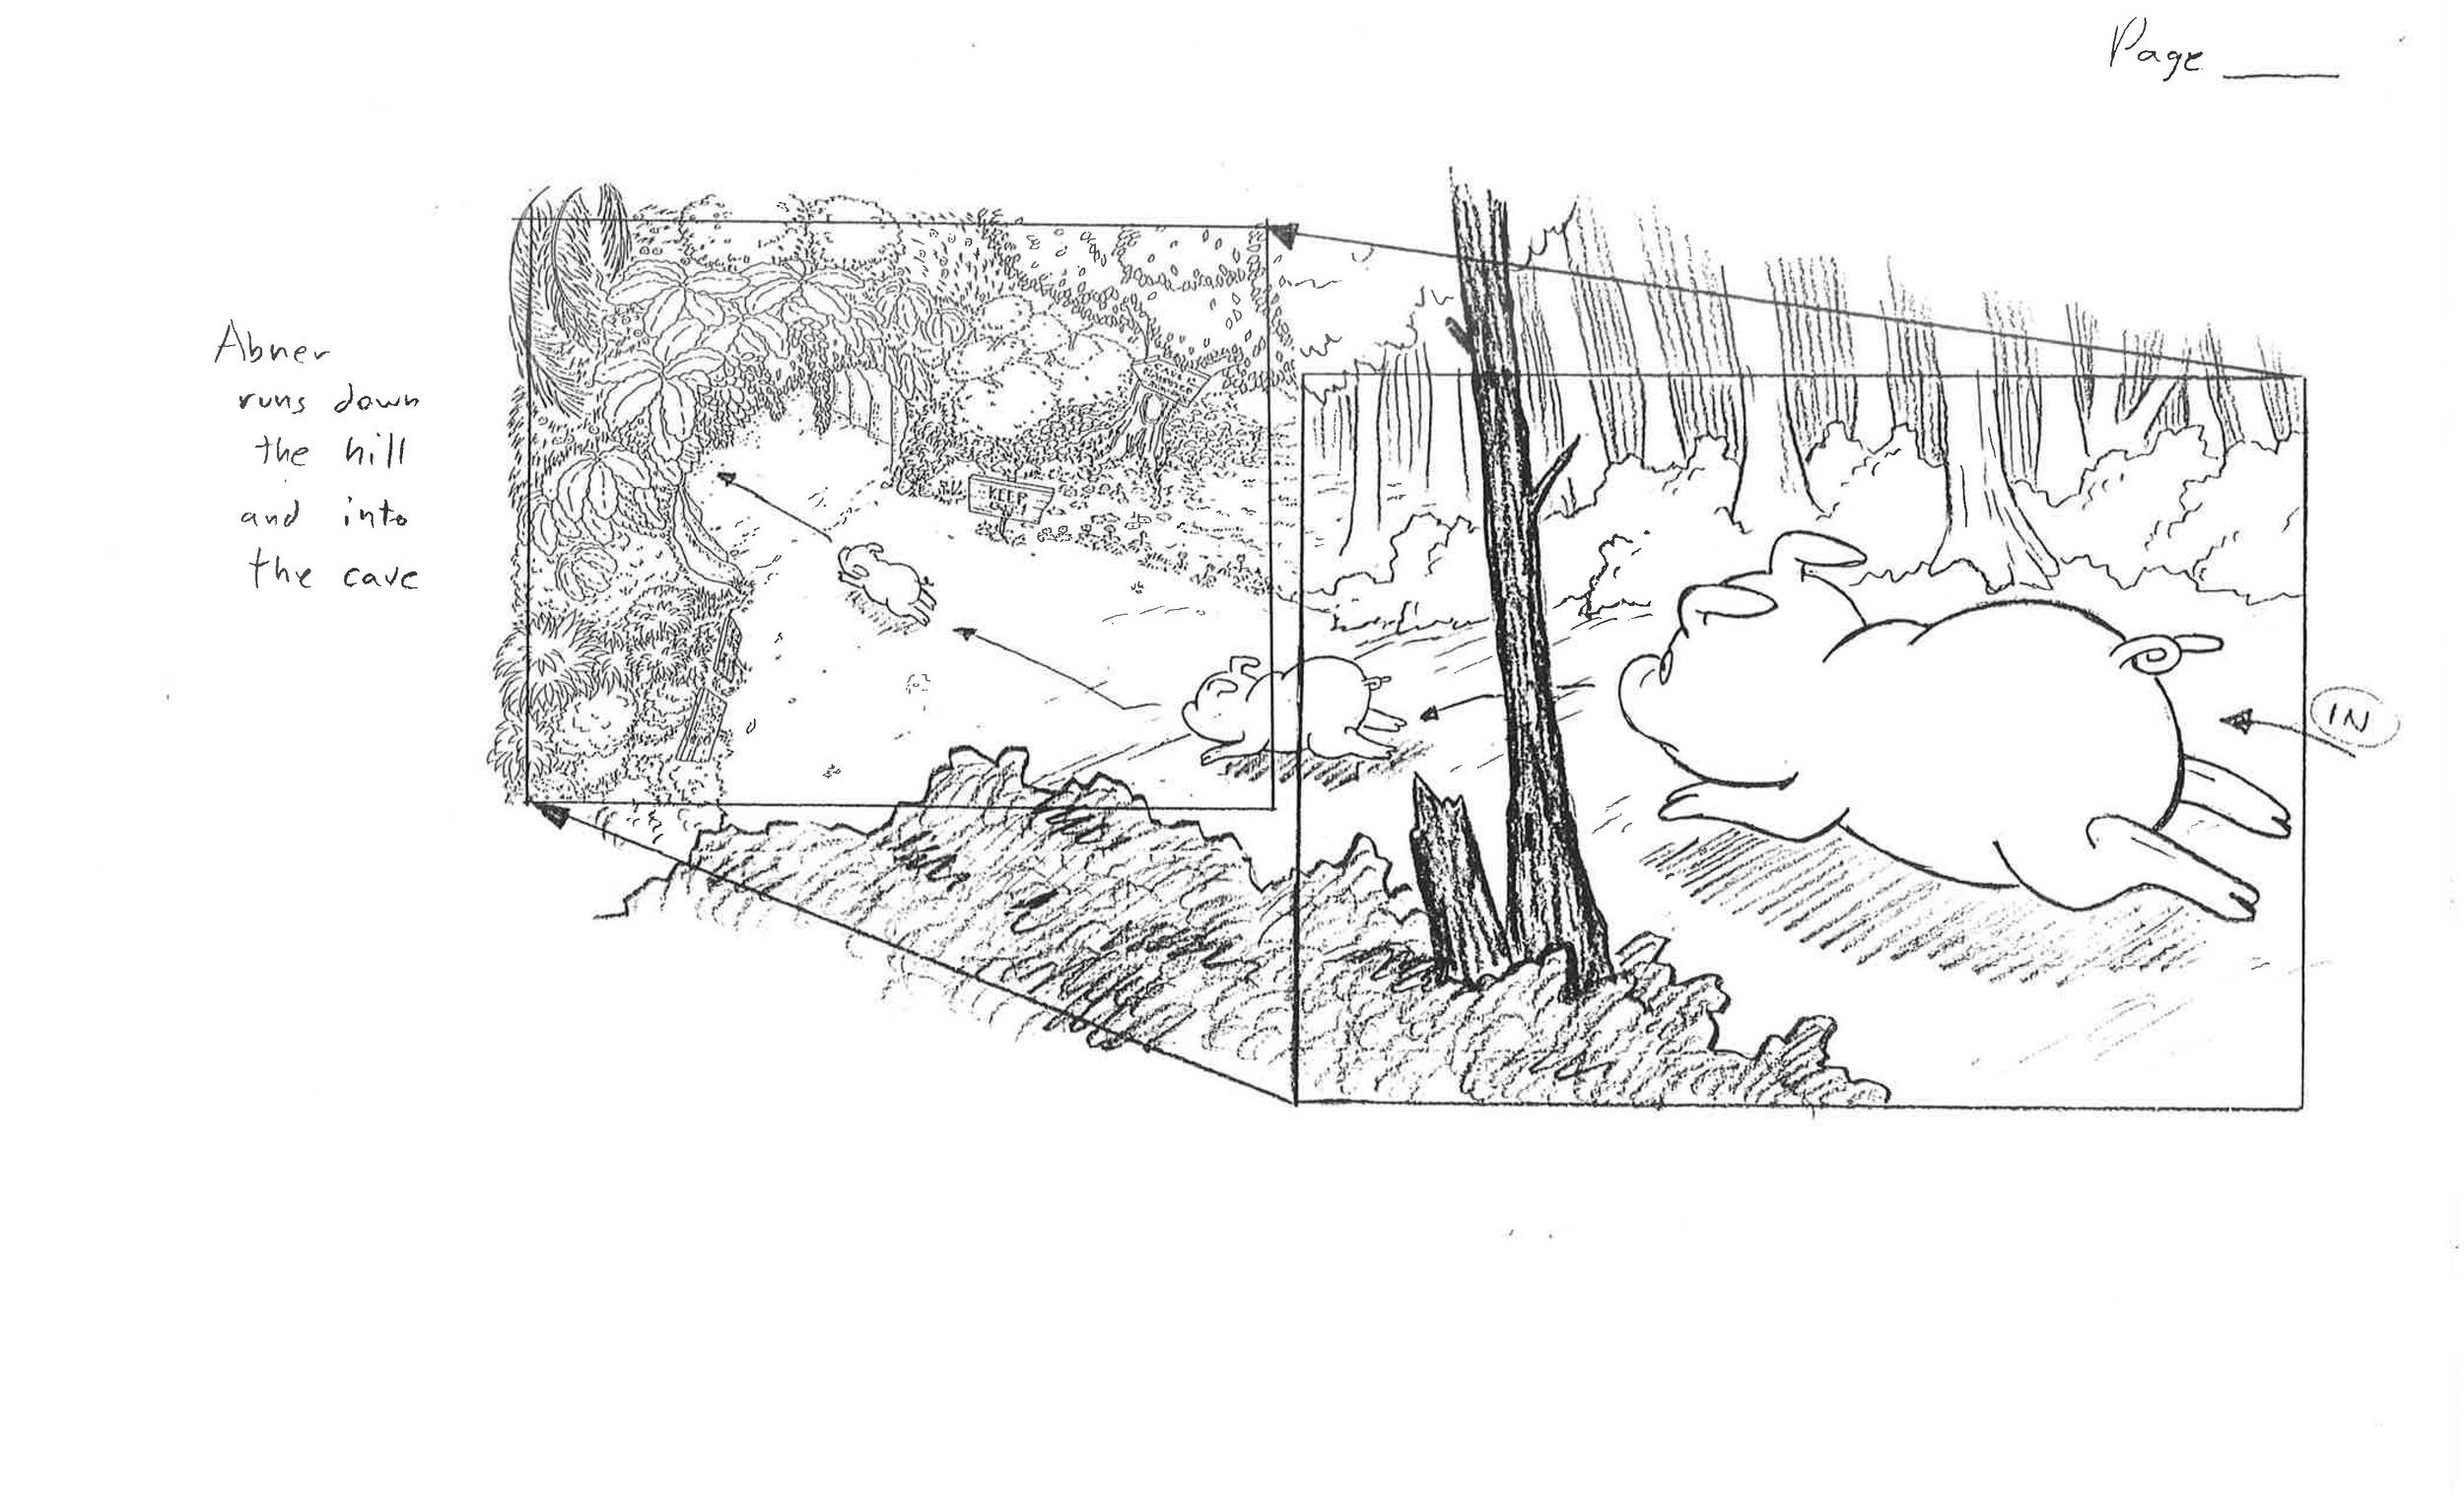 PigWar-page28.jpg